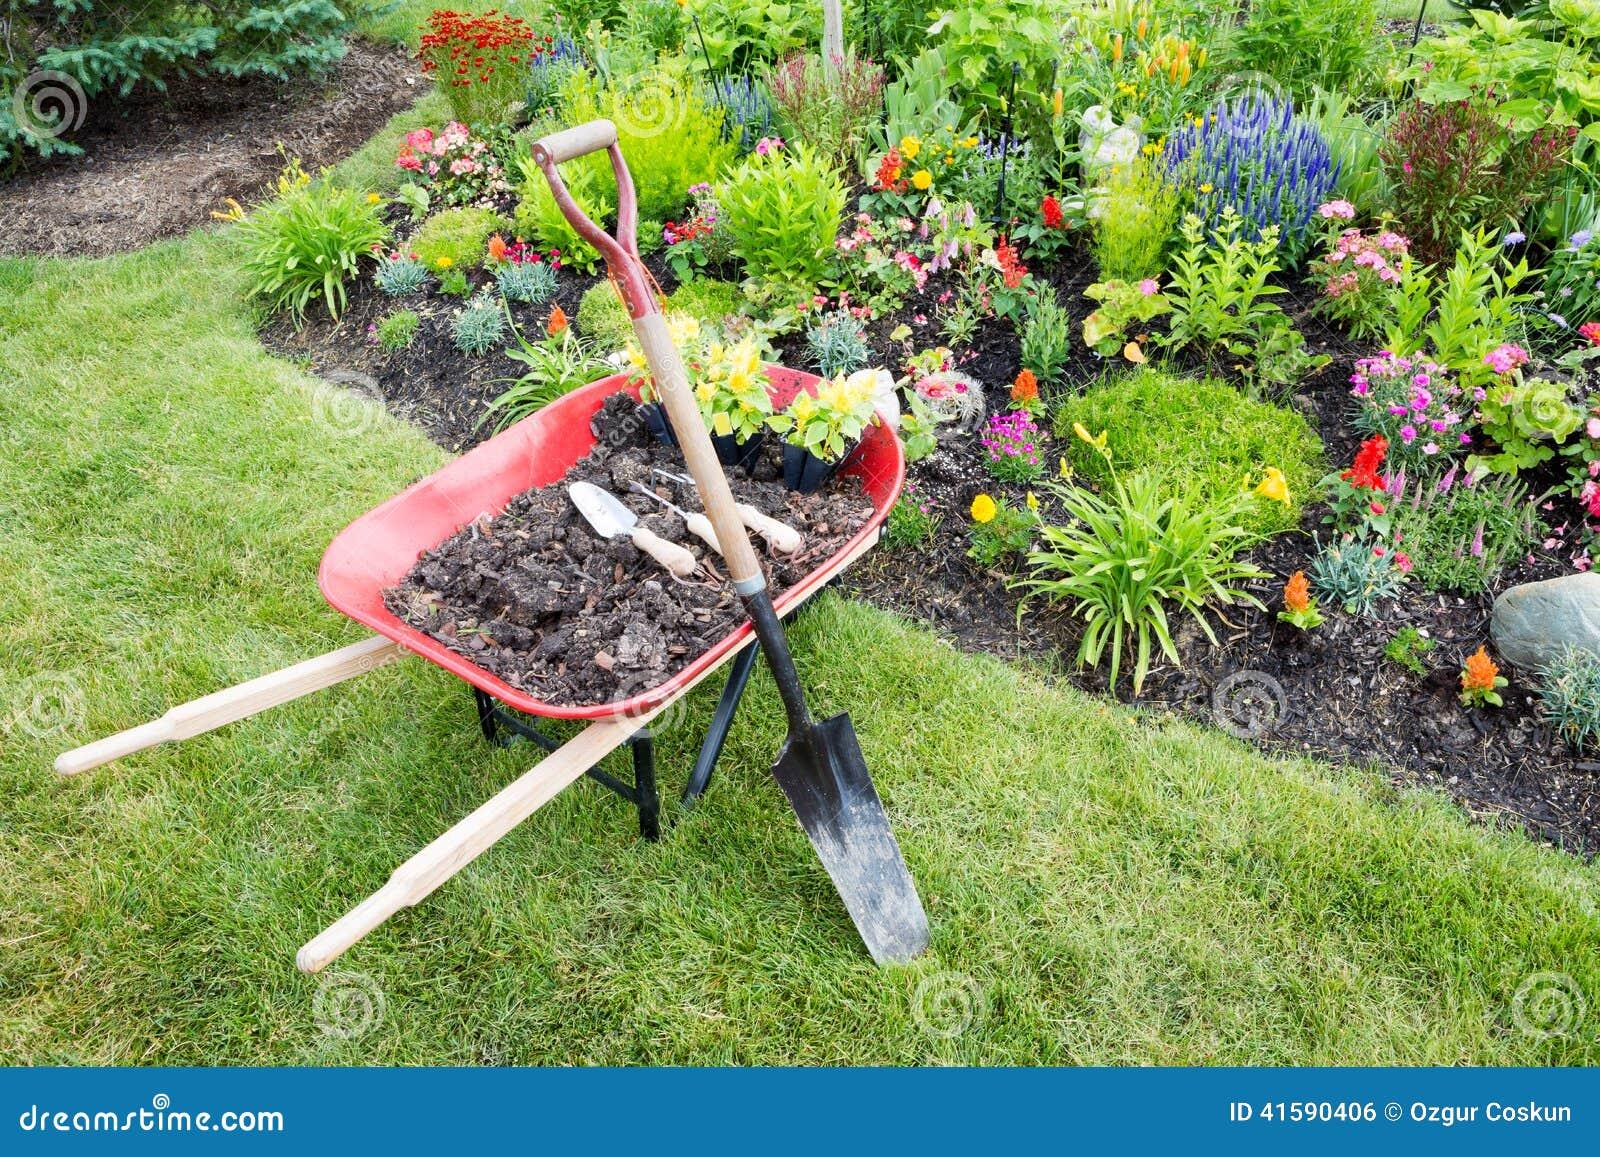 Garden work being done landscaping a flowerbed stock photo for Topsoil garden soil